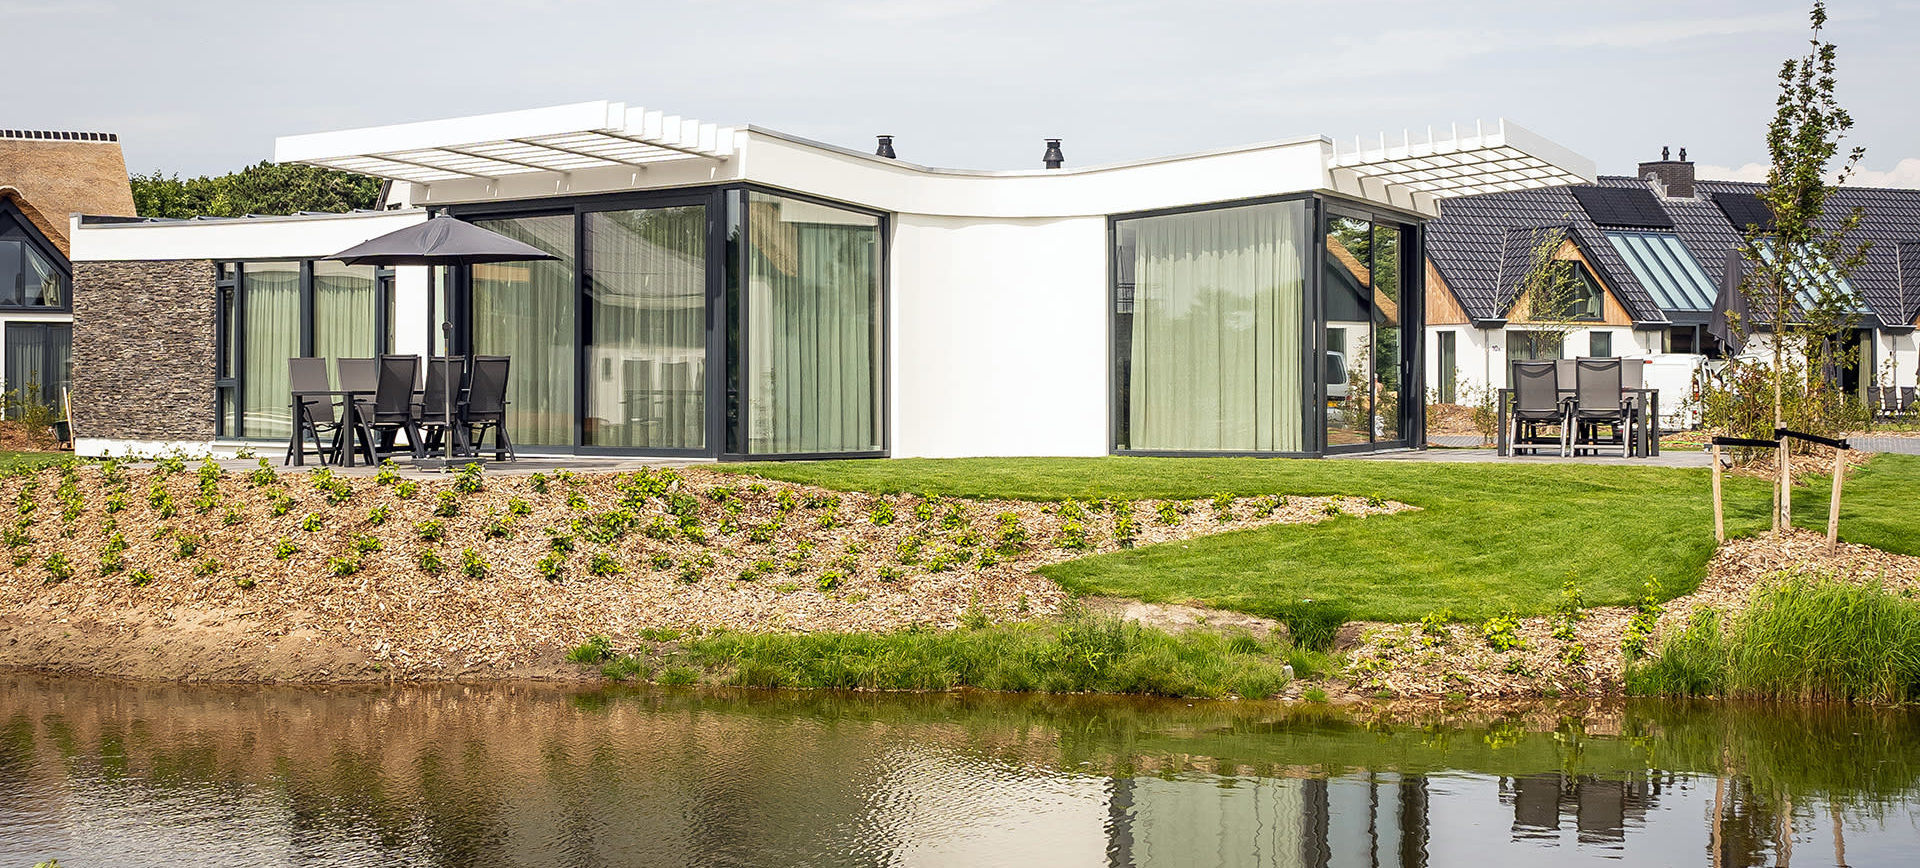 Supertrips - Luxe Villa's De Koog